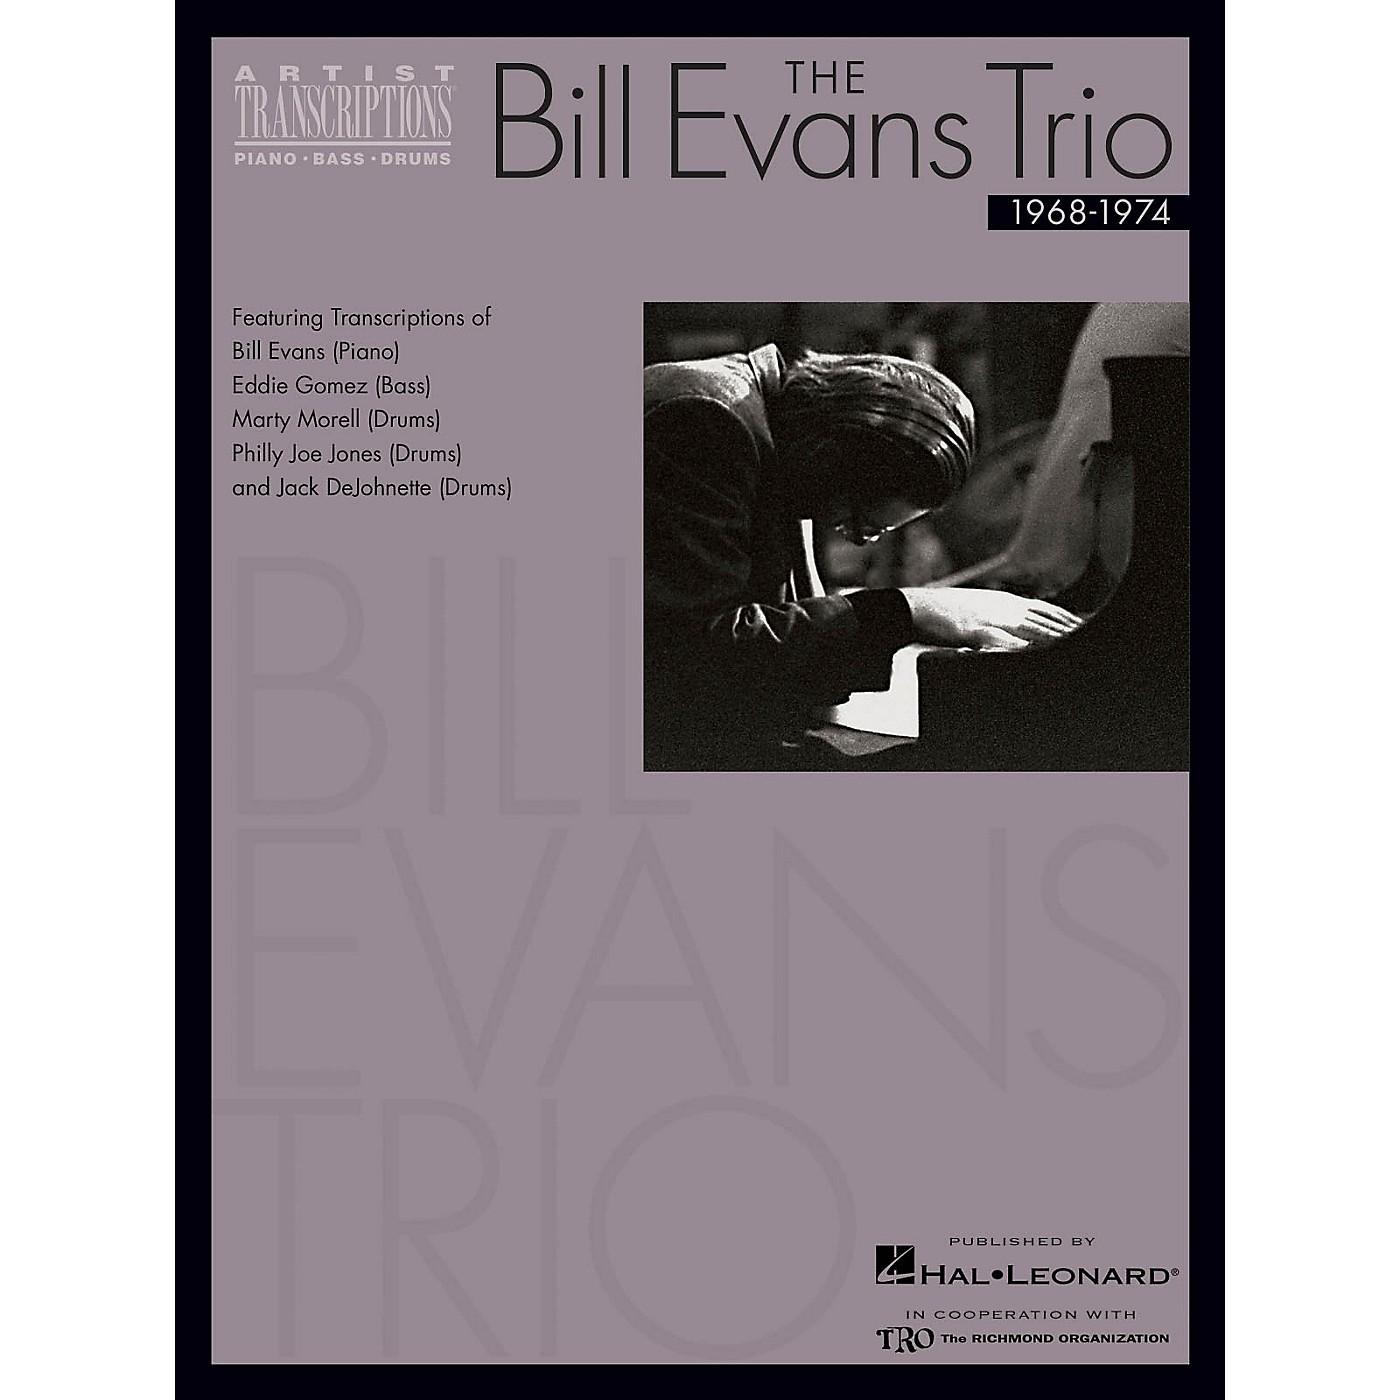 Hal Leonard The Bill Evans Trio - Volume 3 (1968-1974) Artist Transcriptions Series Performed by Bill Evans thumbnail